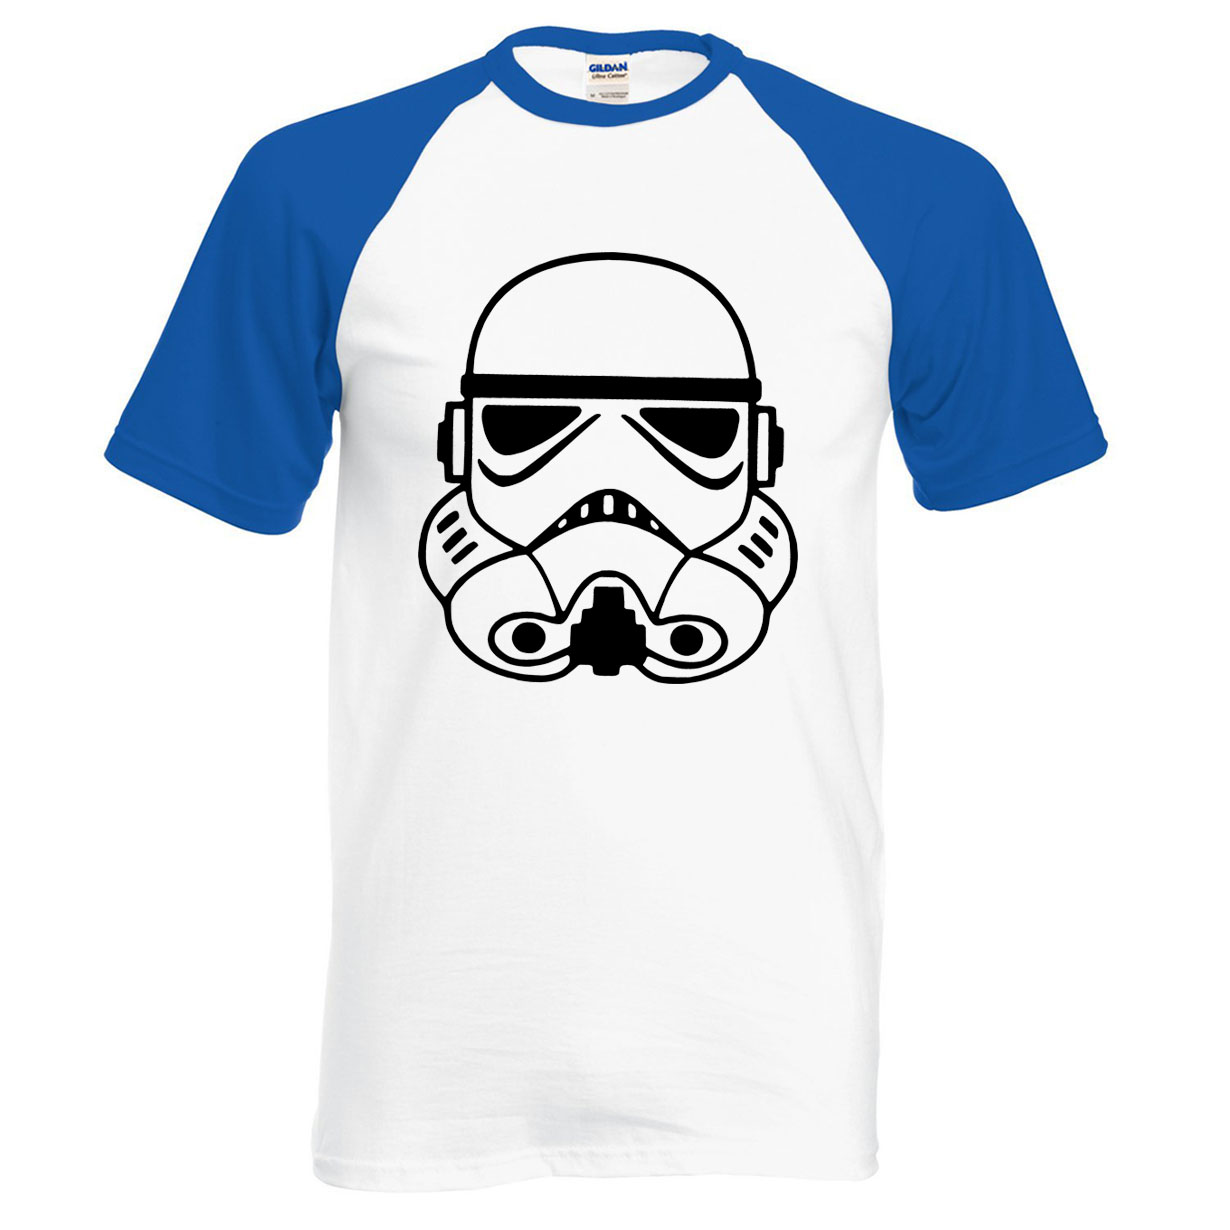 Hot Sale Star Wars raglan men t shirt 2019 new summer 100% cotton Vader men t shirts fashion casual simple style loose top tees